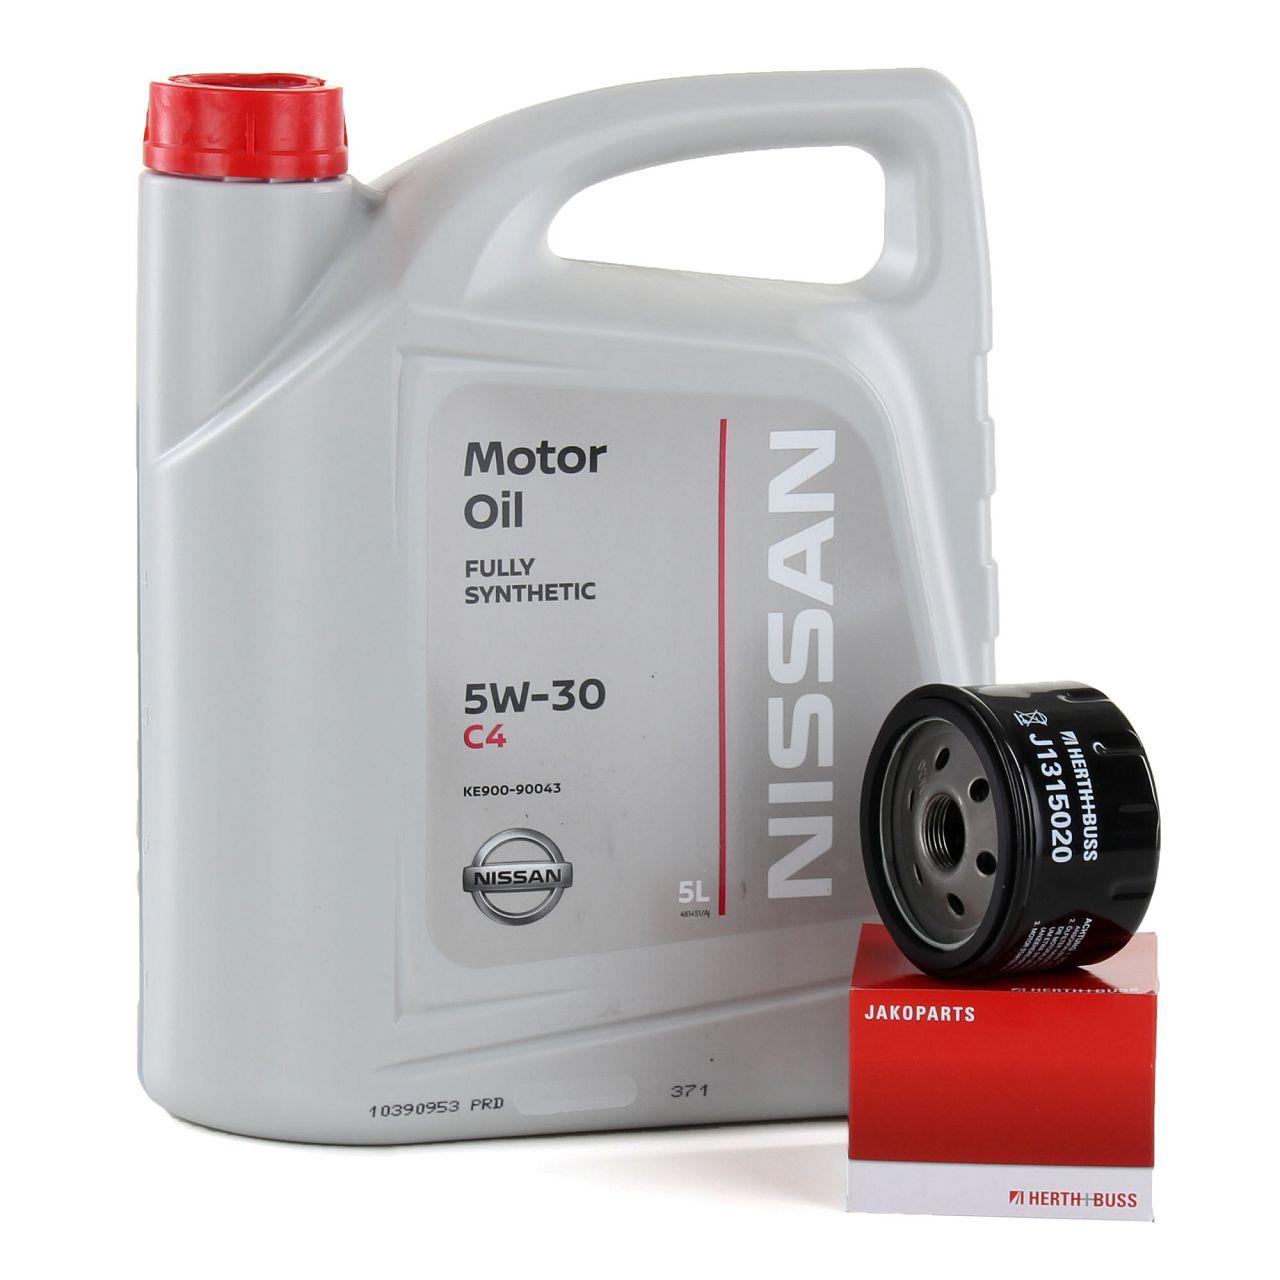 Original NISSAN Motoröl 5W30 DPF ACEA C4 DIESEL 5L+HERTH+BUSS Ölfilter J1315020